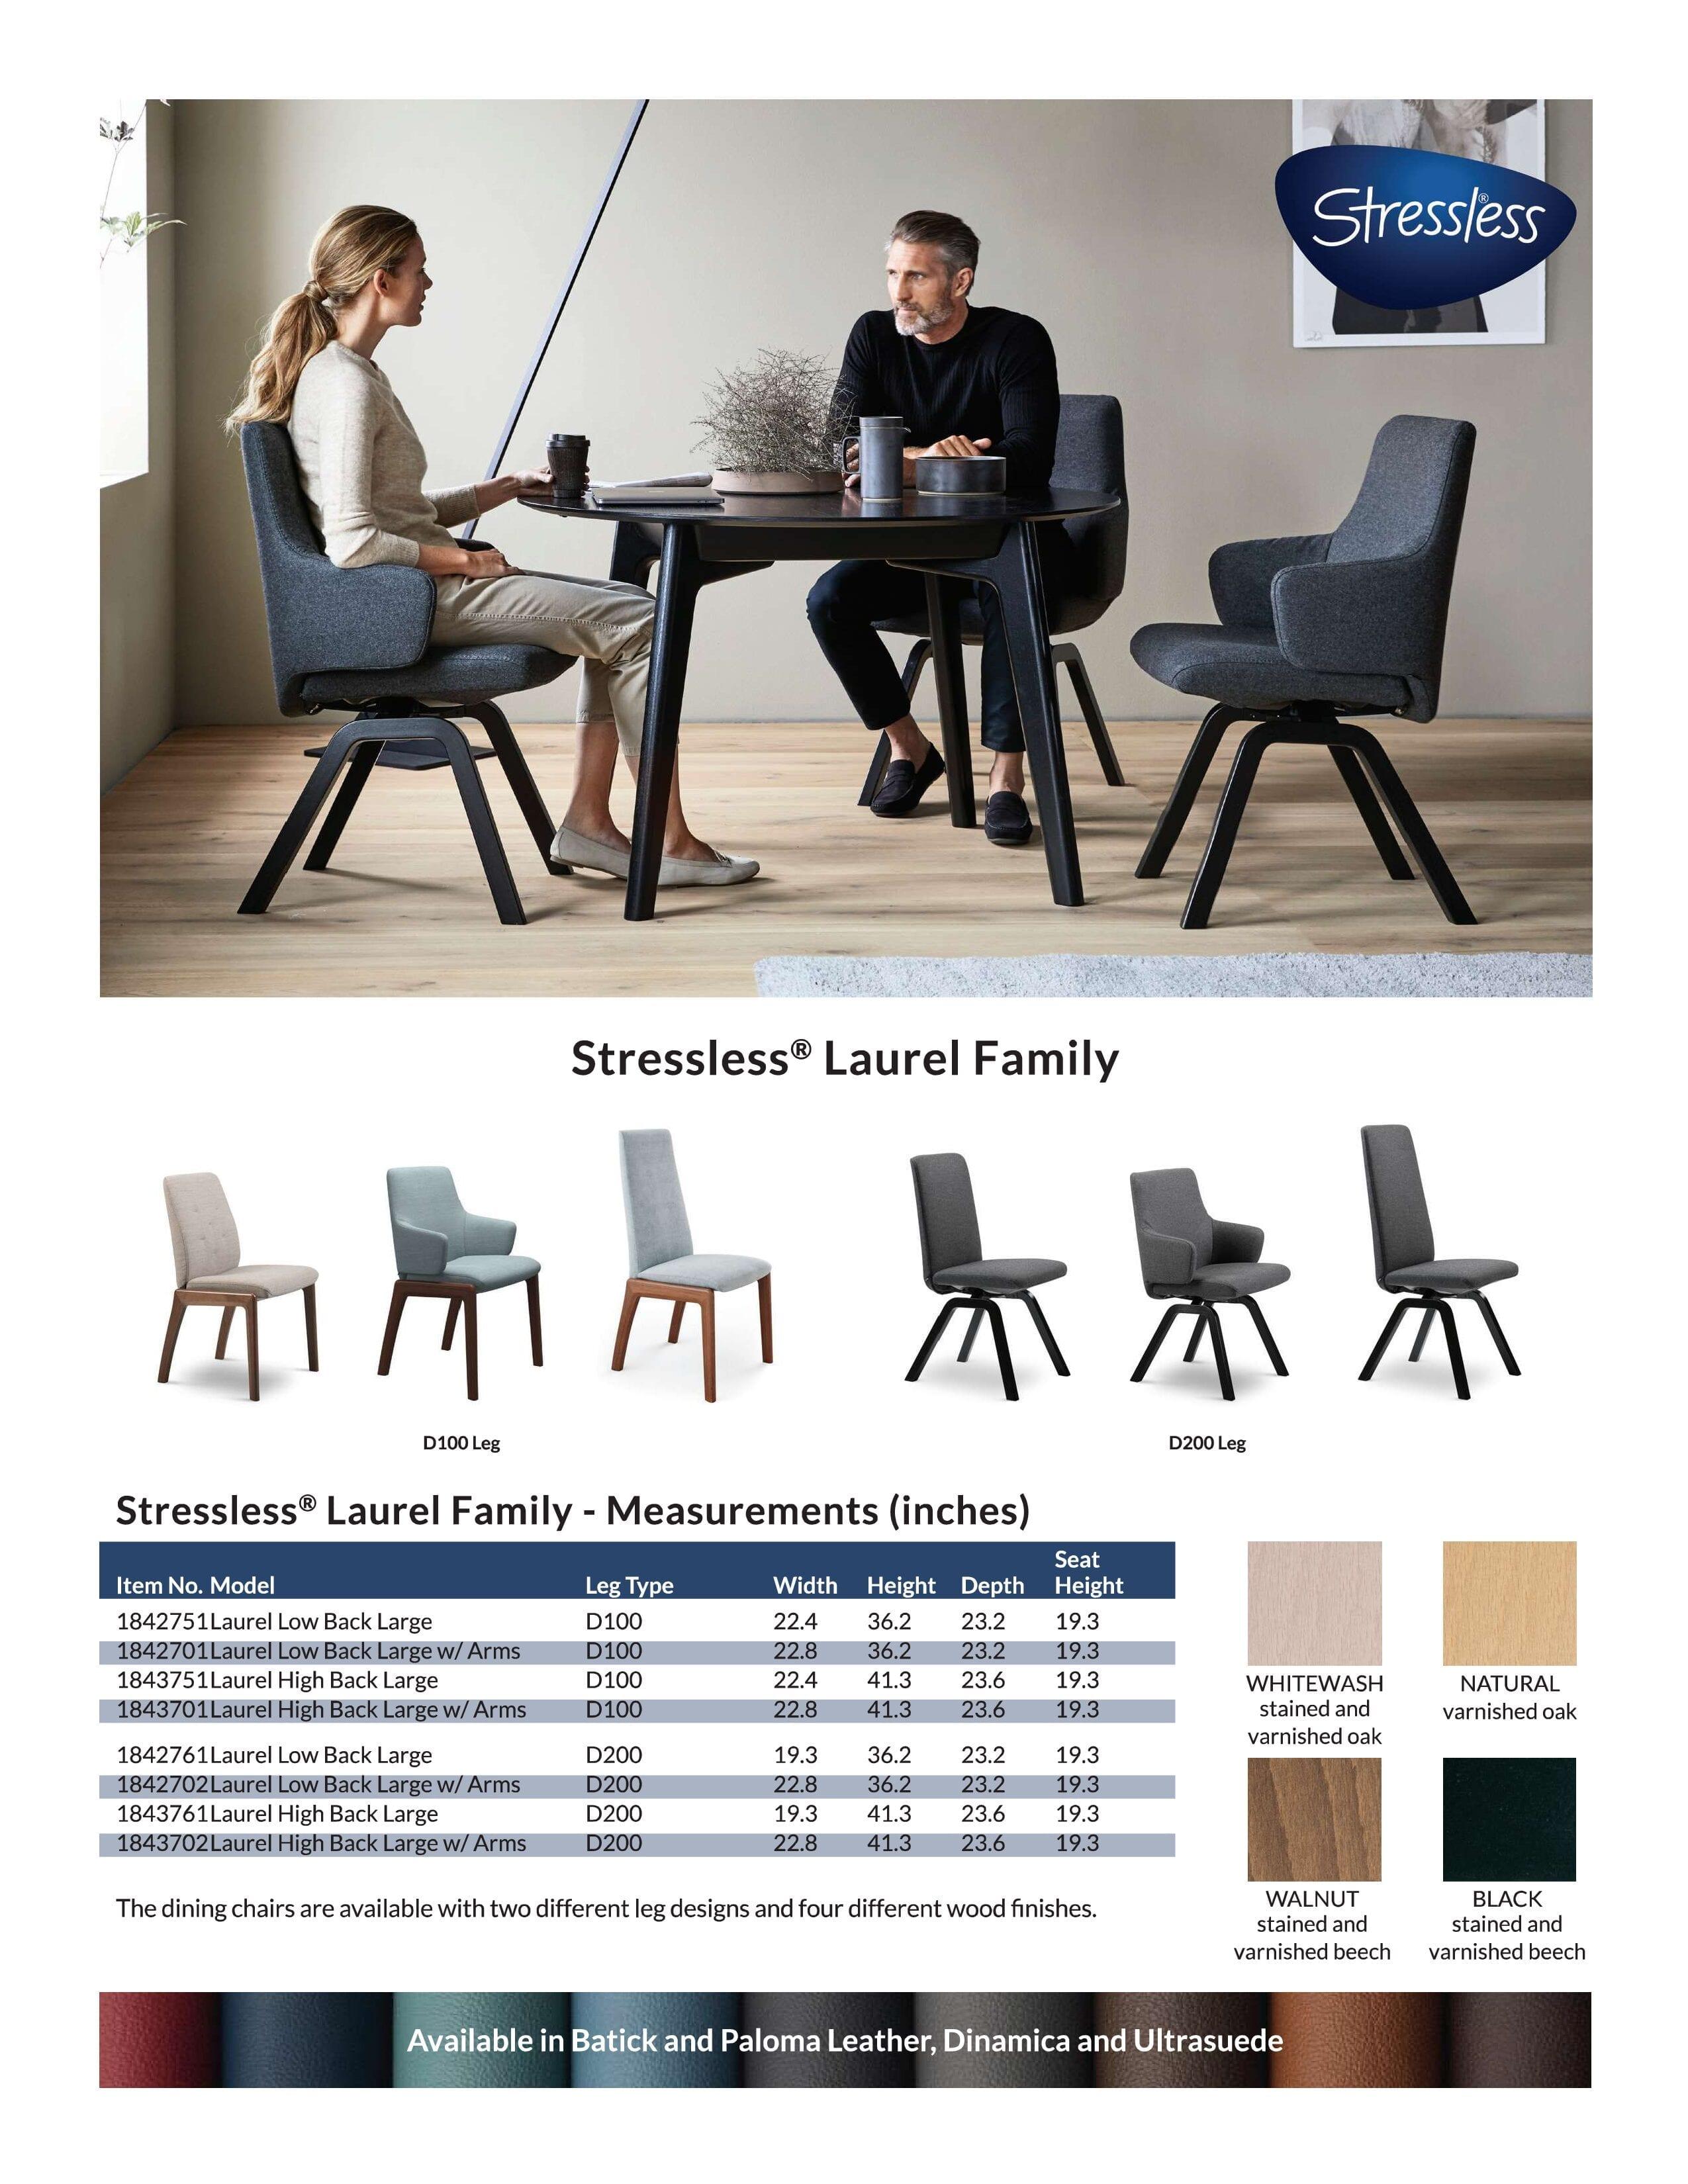 Stressless Laurel Family Product Sheet